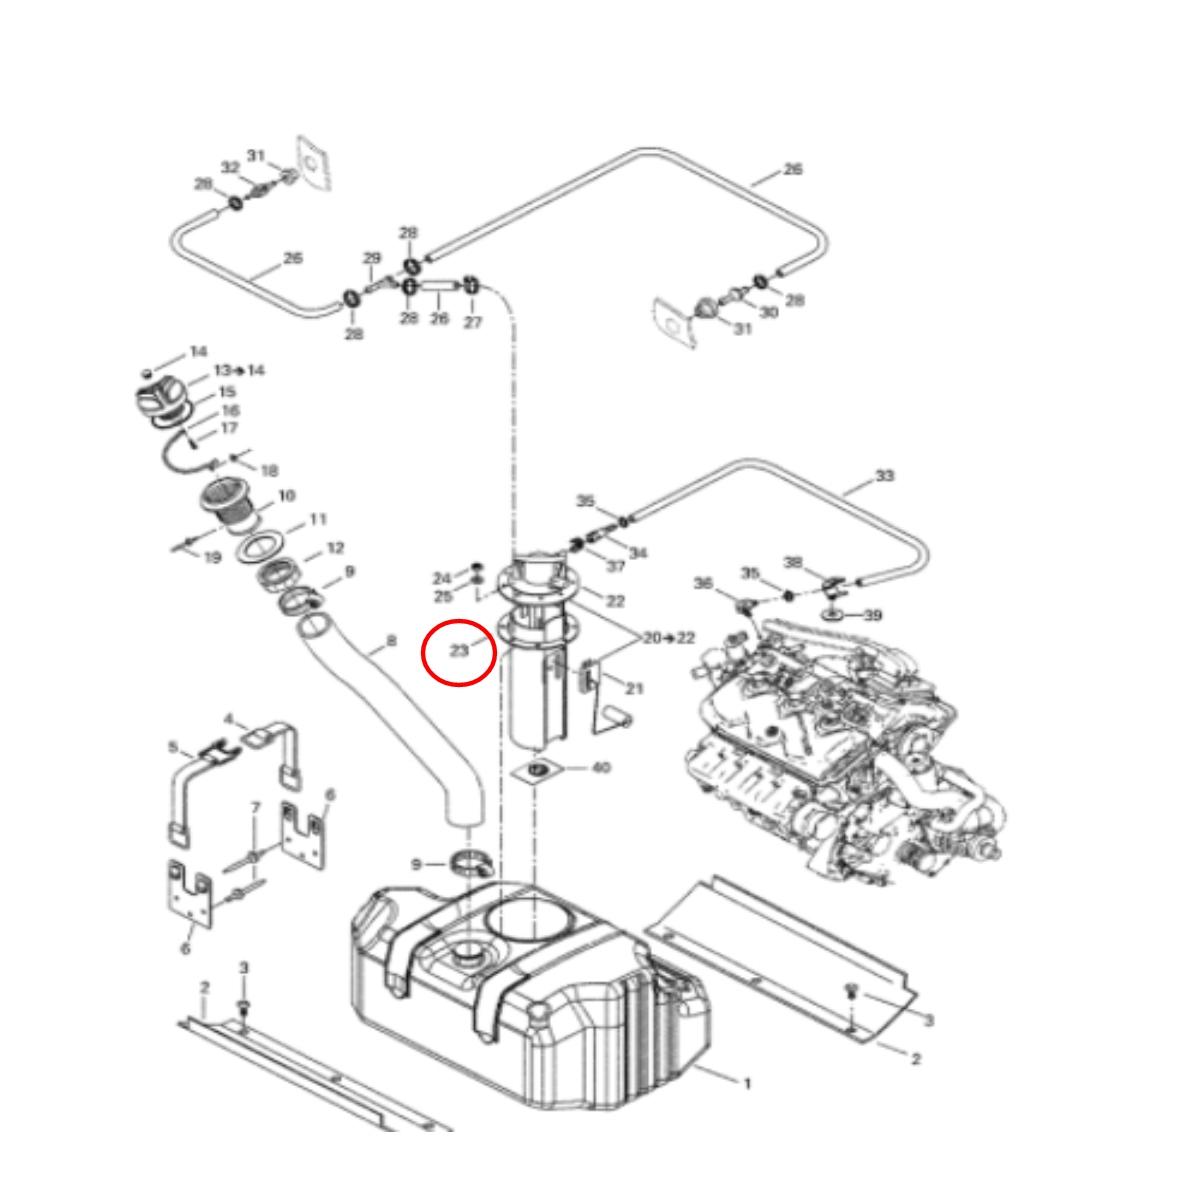 BOMBA DE COMBUSTIVEL PARA JET SKI  SEA DOO GTI 4 TEC ORIGINAL  - Radical Peças - Peças para Jet Ski